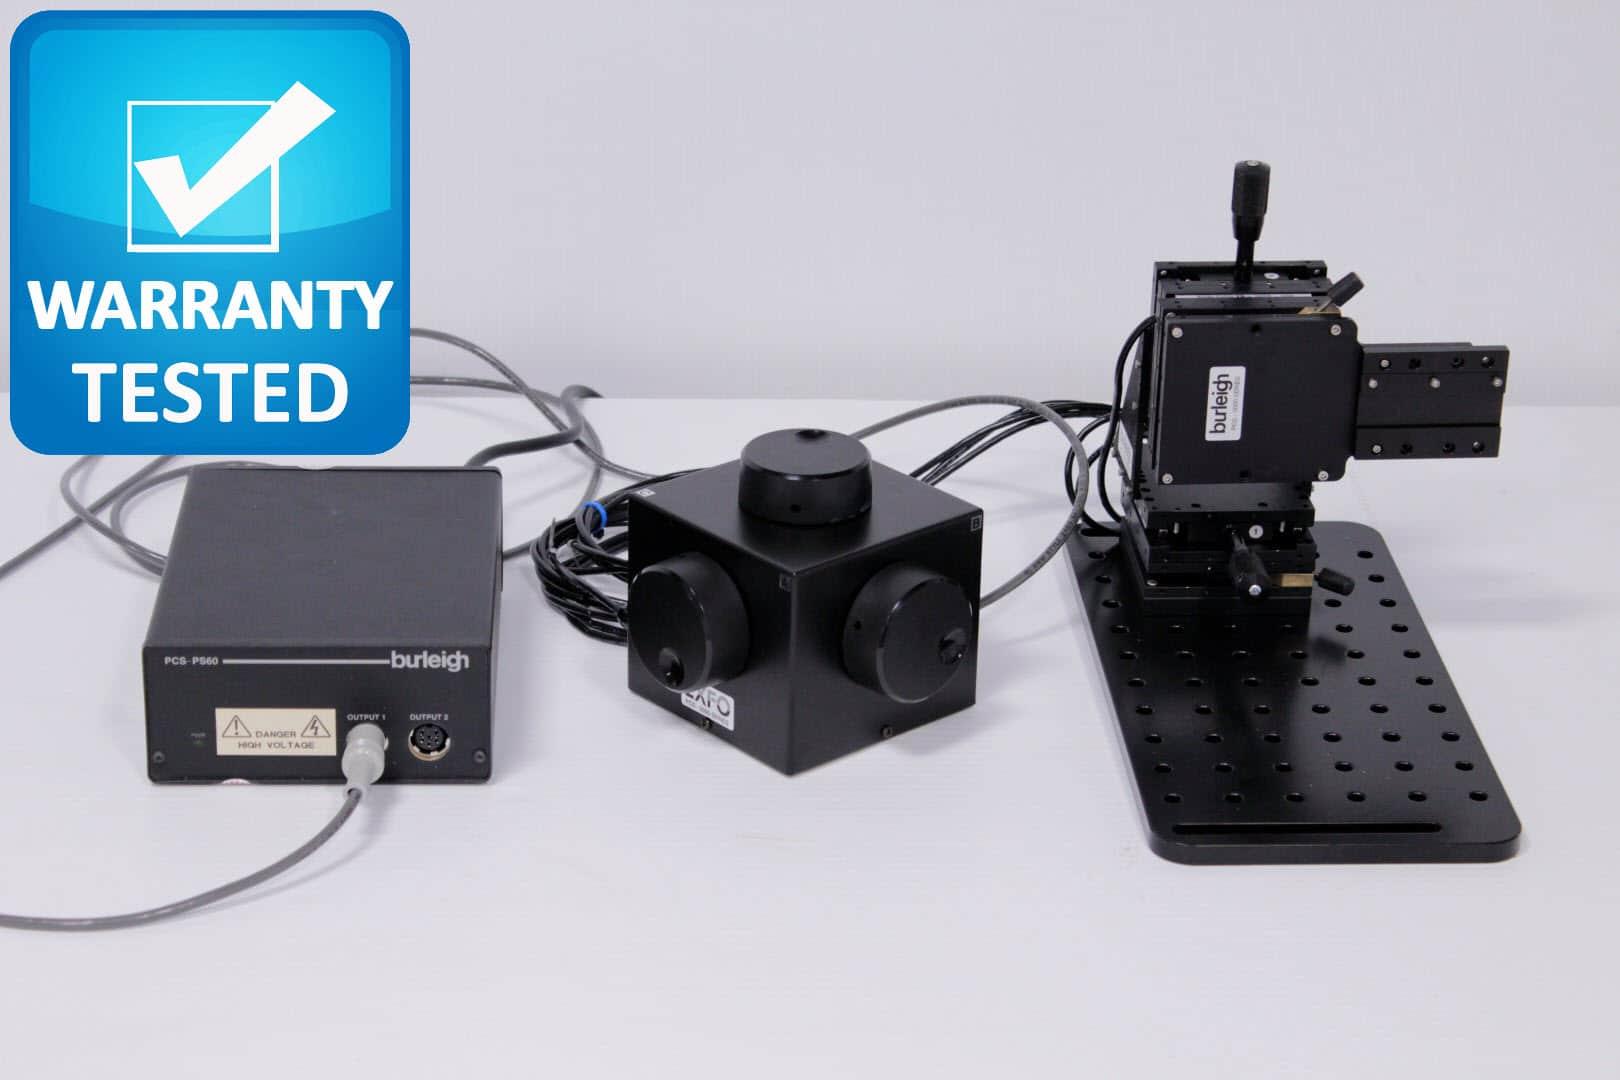 Burleigh PCS-5000 Micromanipulator